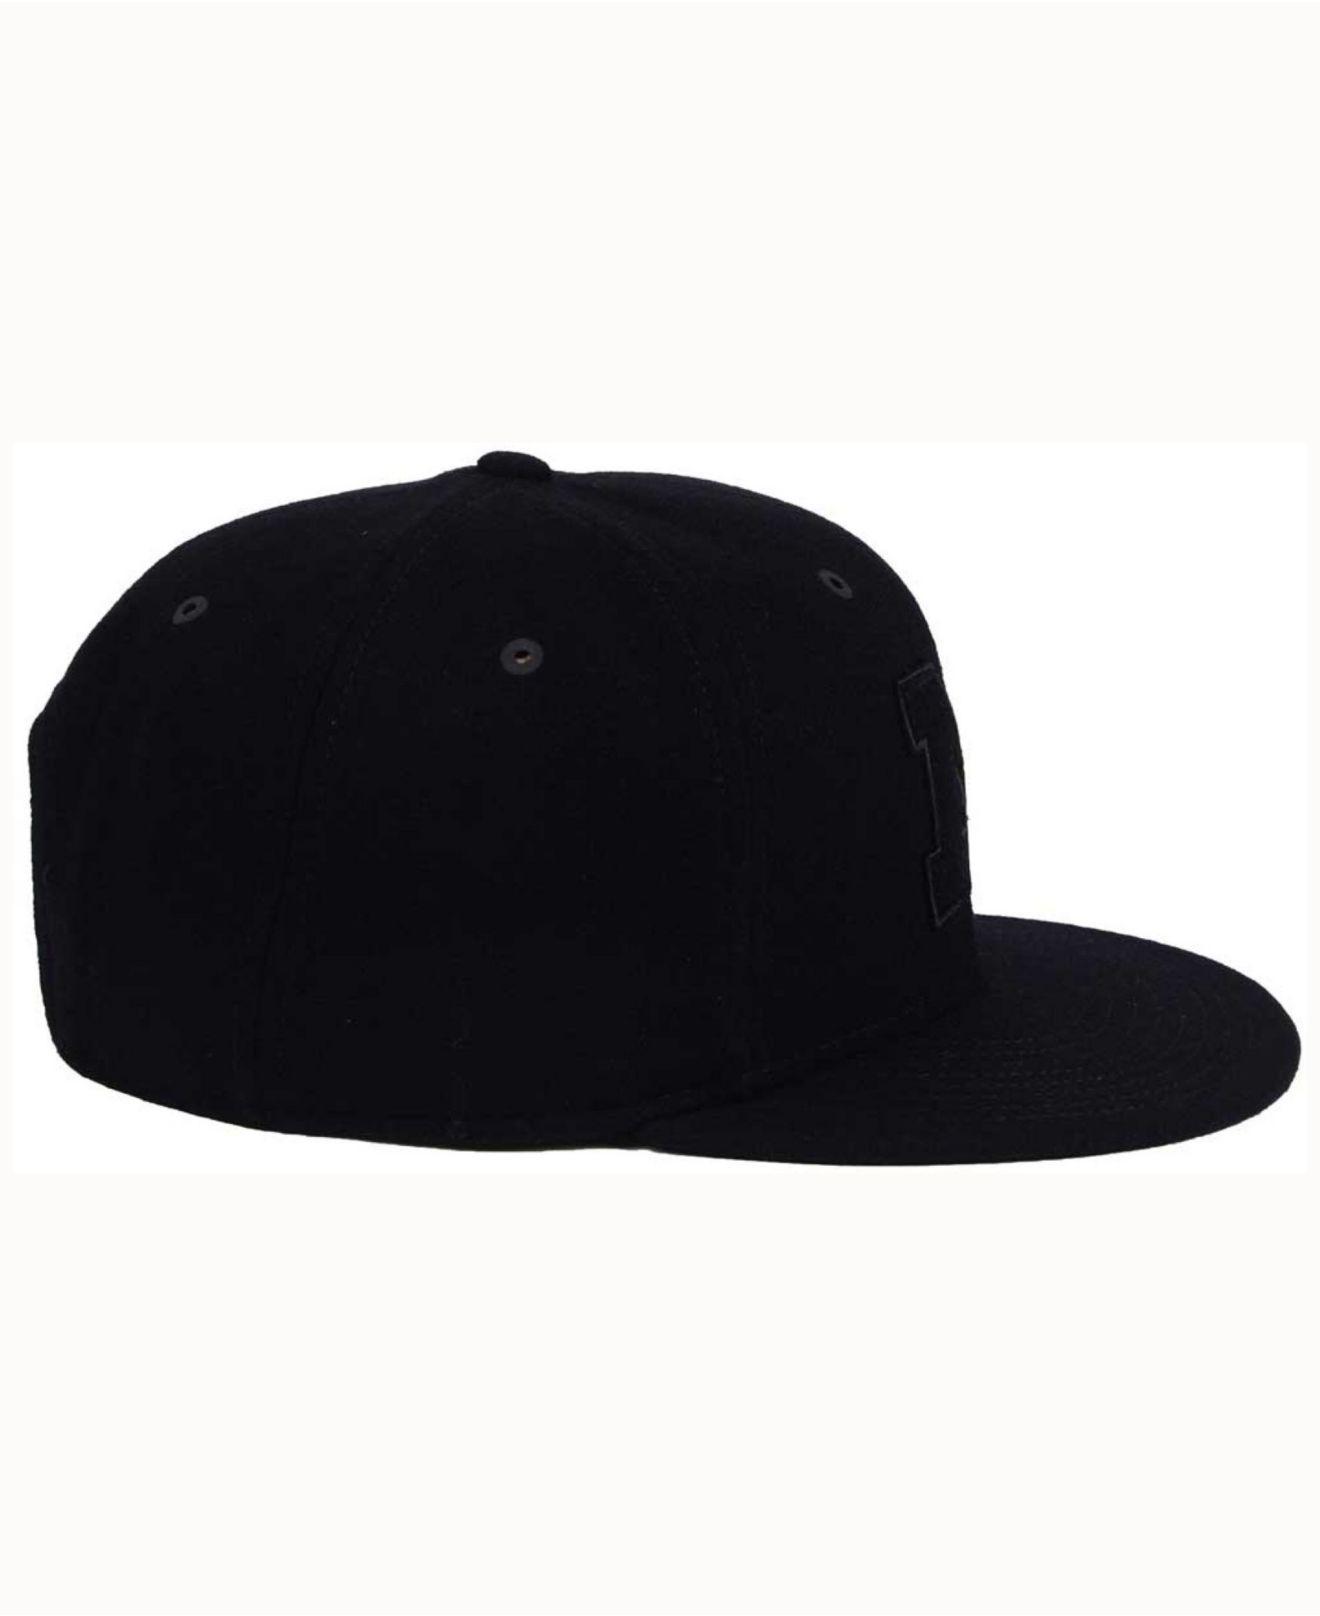 2c4a341d4fe2b ... cheap lyst nike michigan wolverines new day true snapback cap in black  c5582 e6859